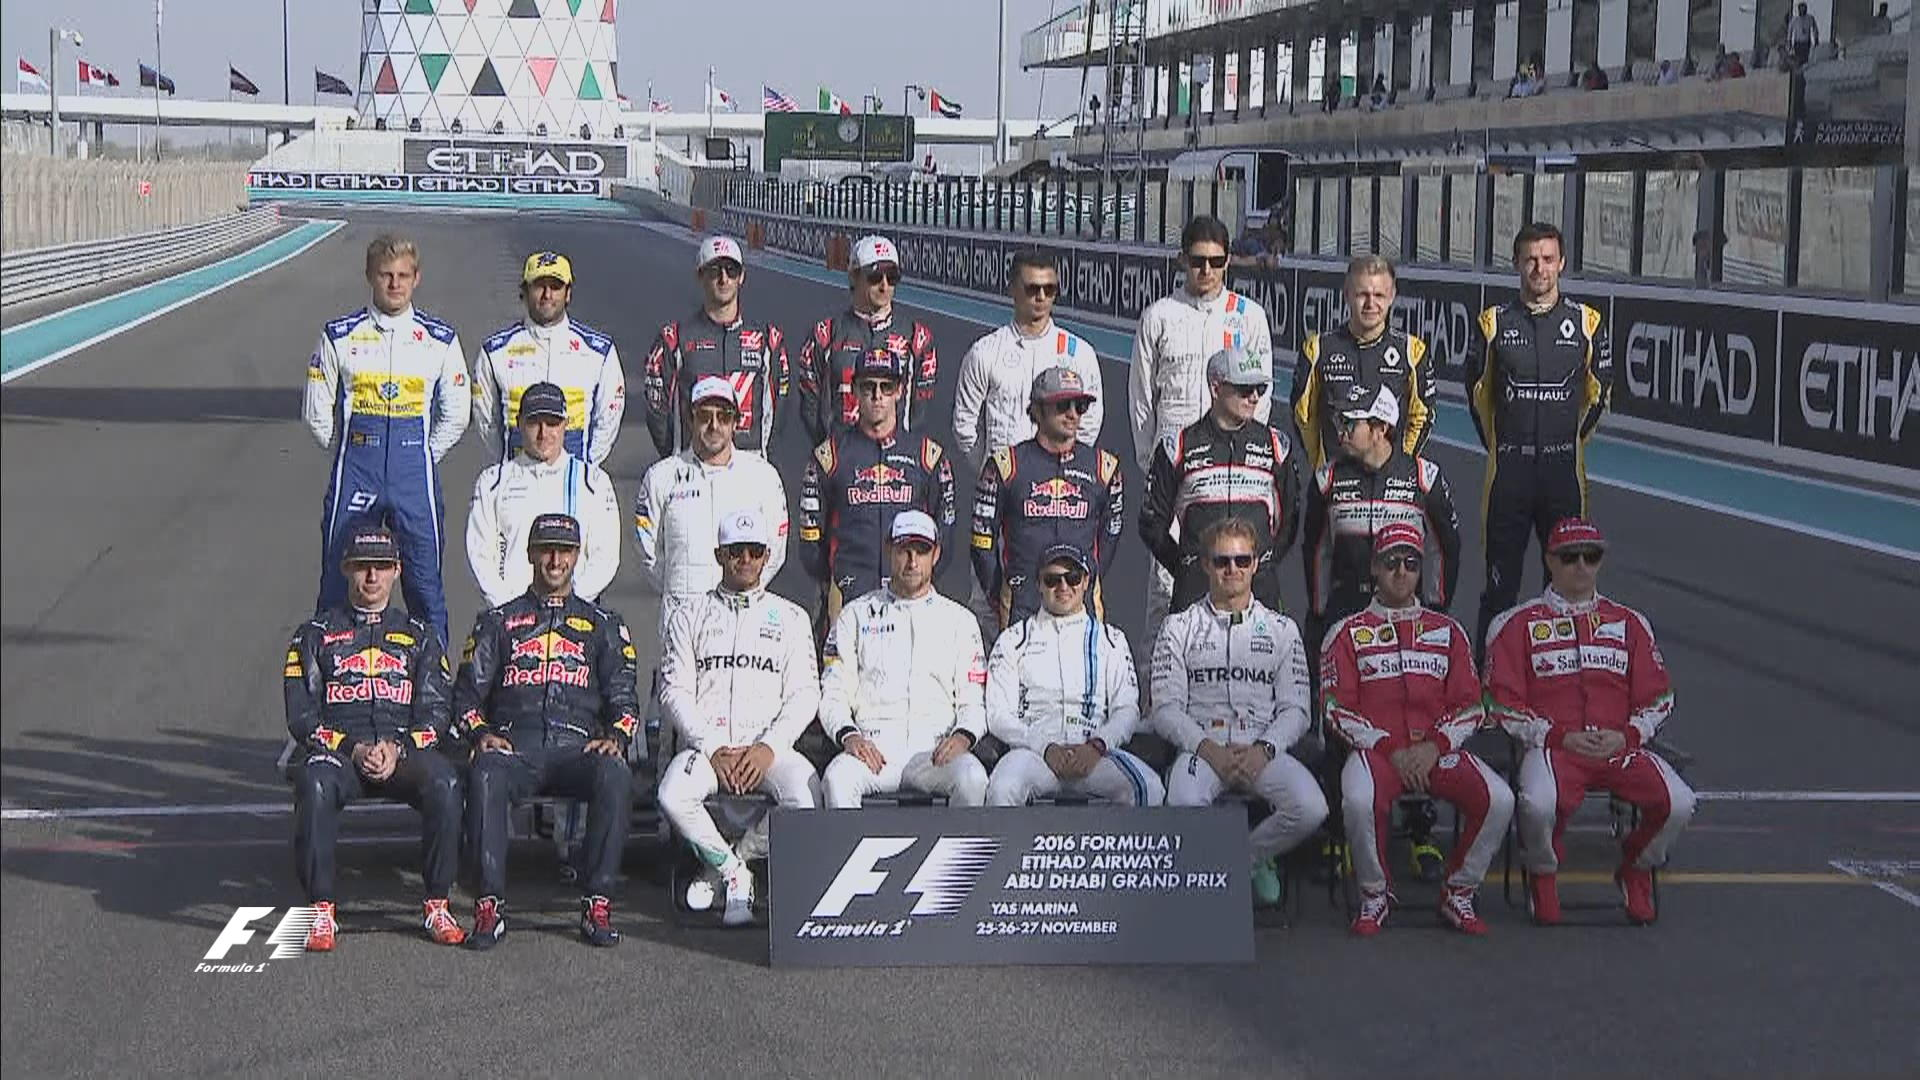 Lista provisional de pilotos de Fórmula 1 publicada por la FIA para la temporada 2017